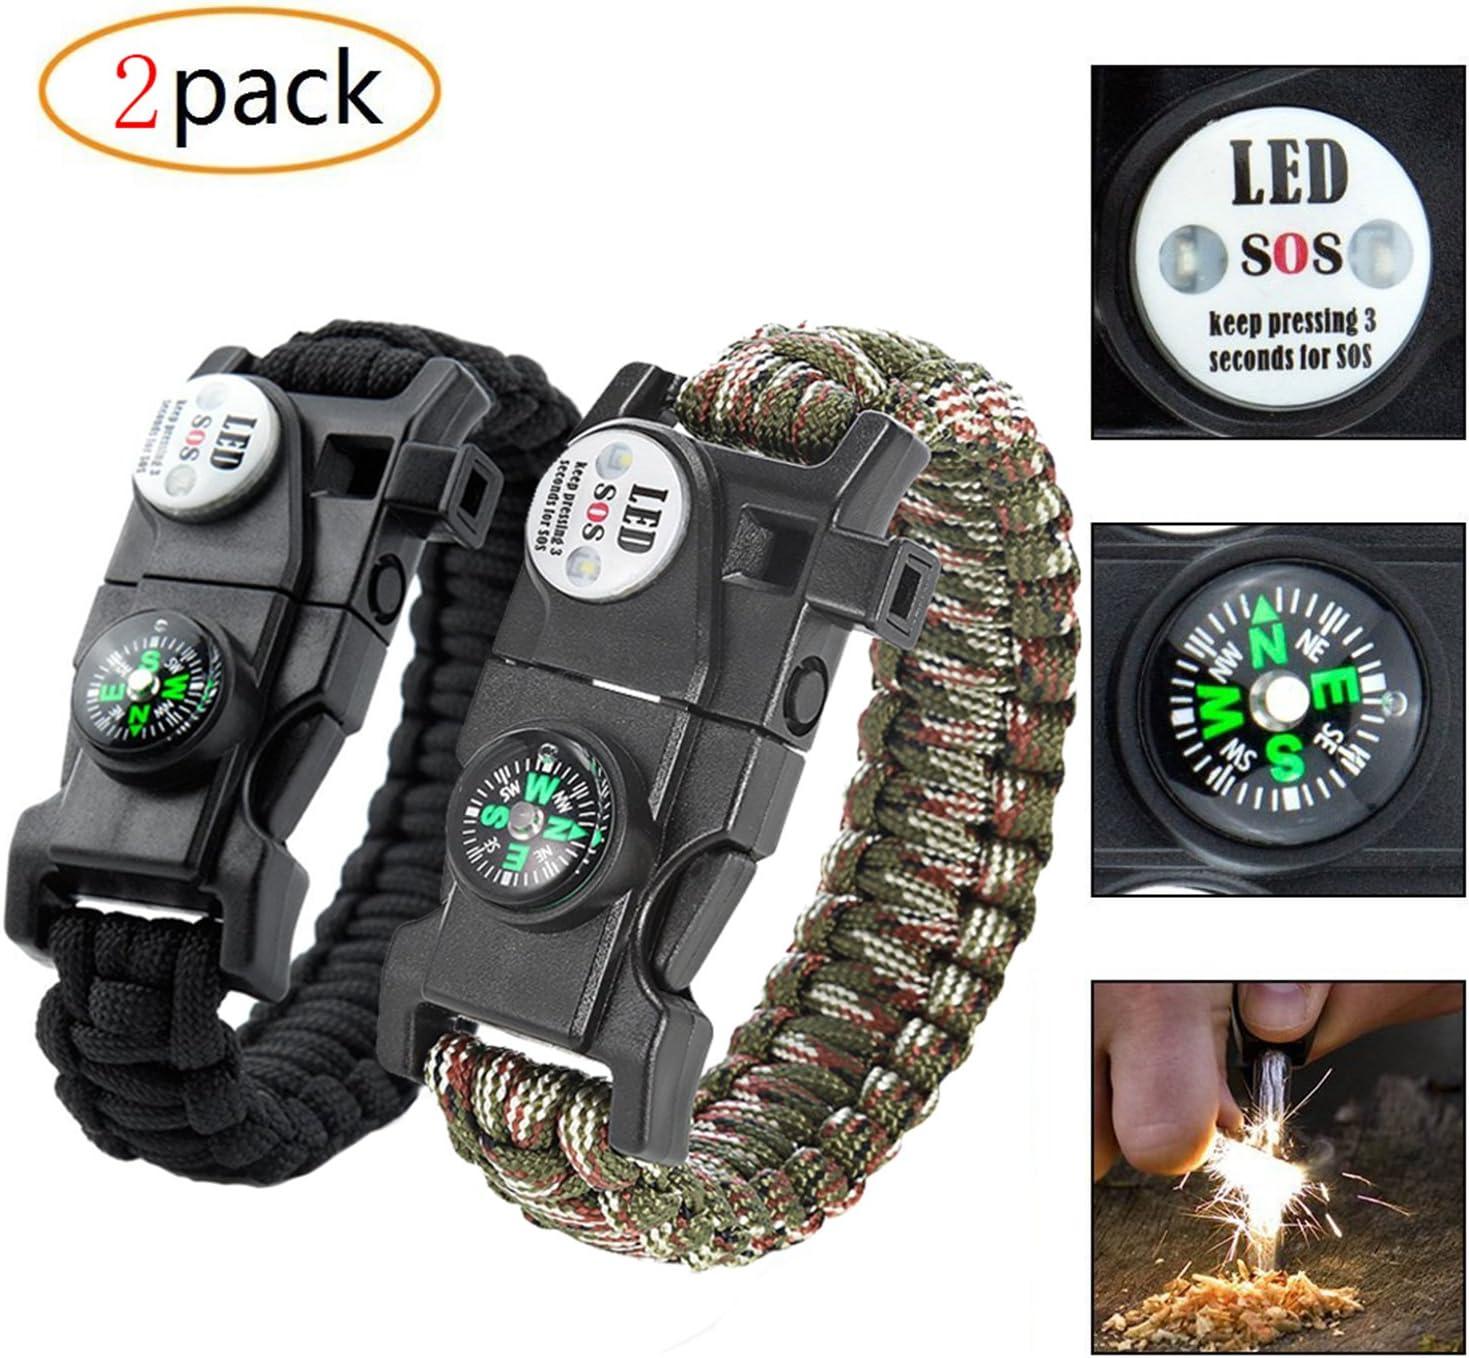 2 Pack] 20 en 1 Paracord supervivencia pulsera, máxima carga 250 kg, con Multi Tool, fuego Acero, SOS LED Light, brújula, silbato, Mini Cuchillo, termómetro: Amazon.es: Deportes y aire libre